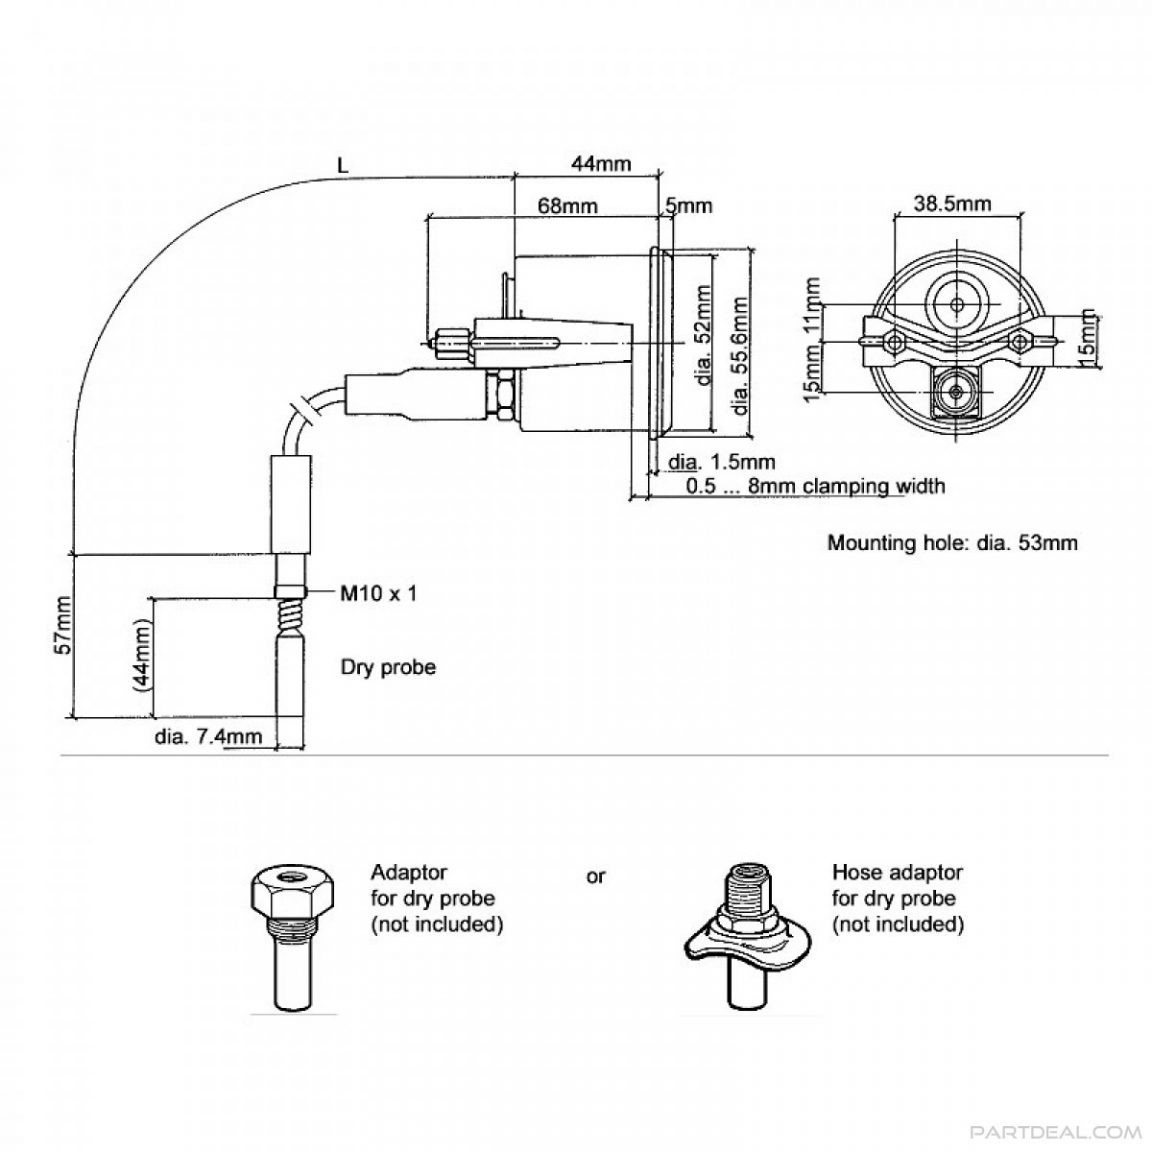 vdo marine oil pressure gauge wiring diagram fishbone template excel free inspirational